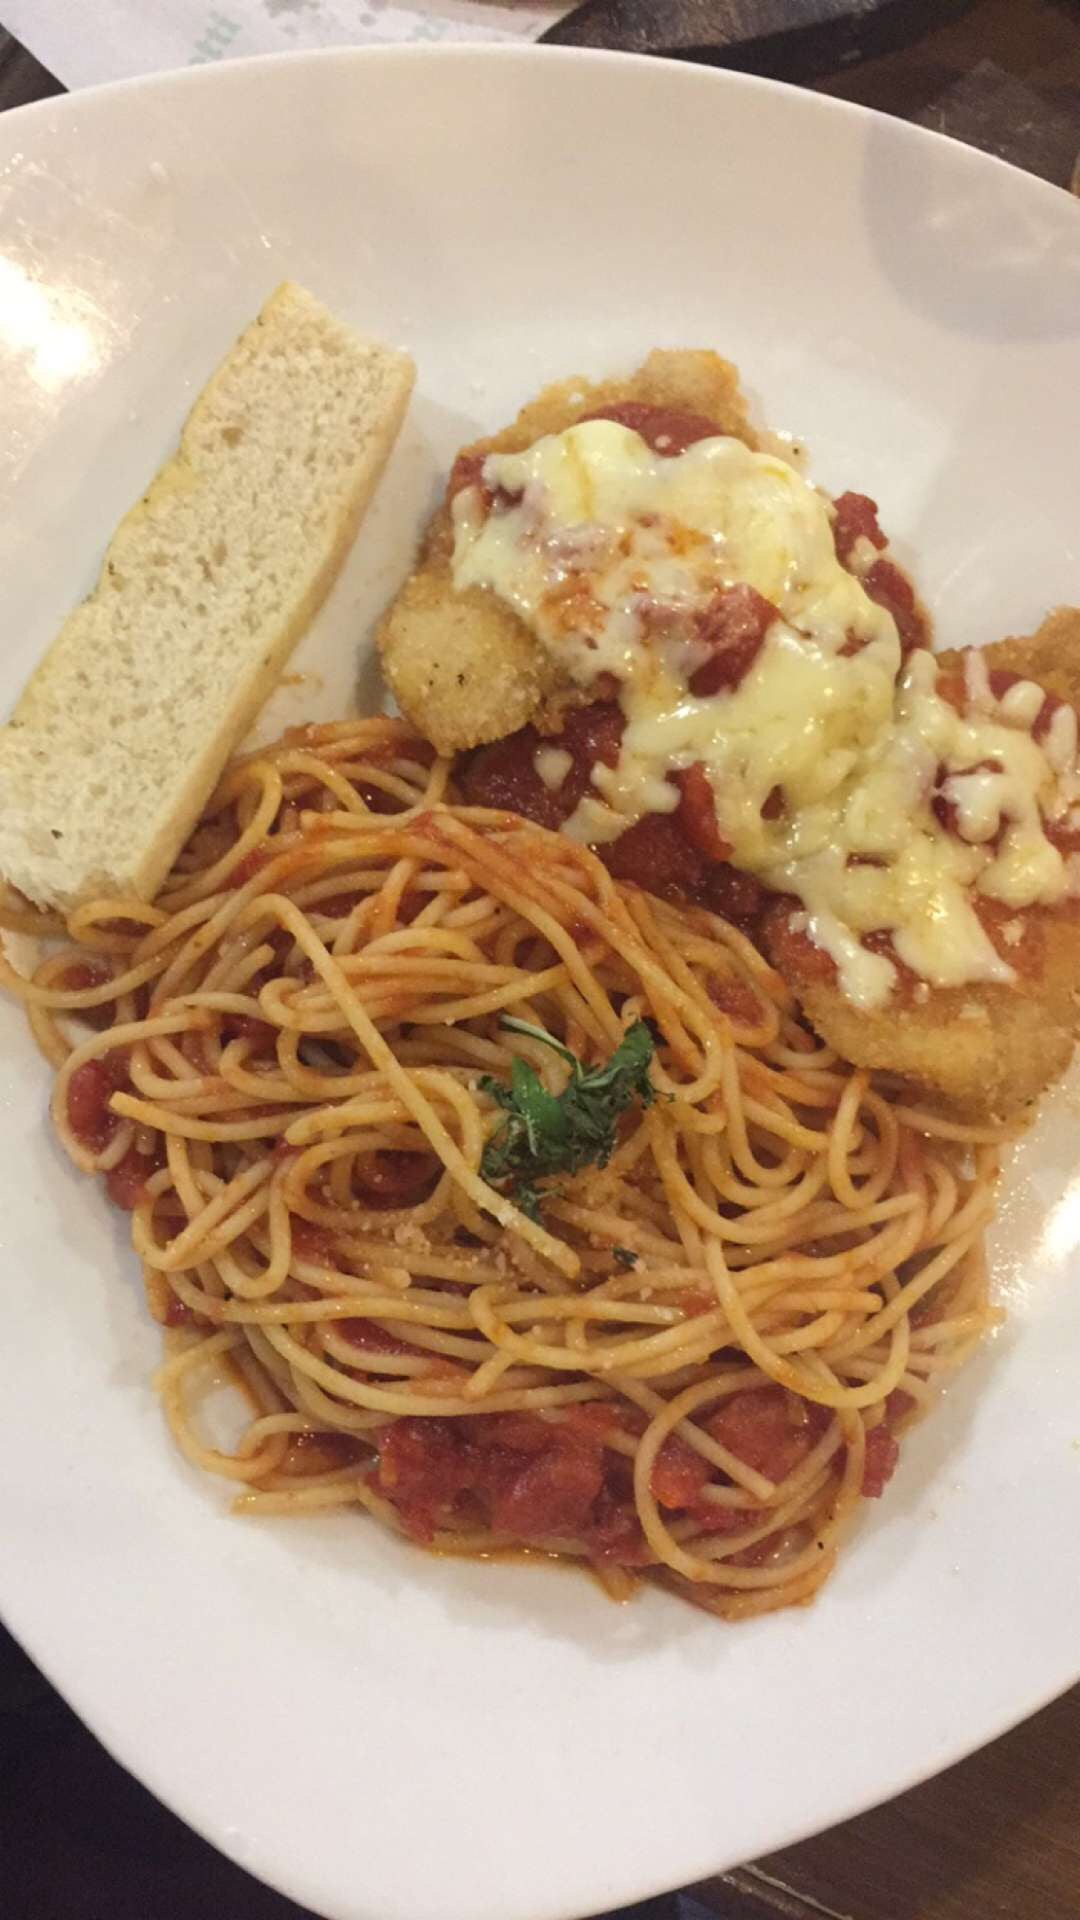 Photo - Manila's The Old Spaghetti House Casual Dining - Metro Manila